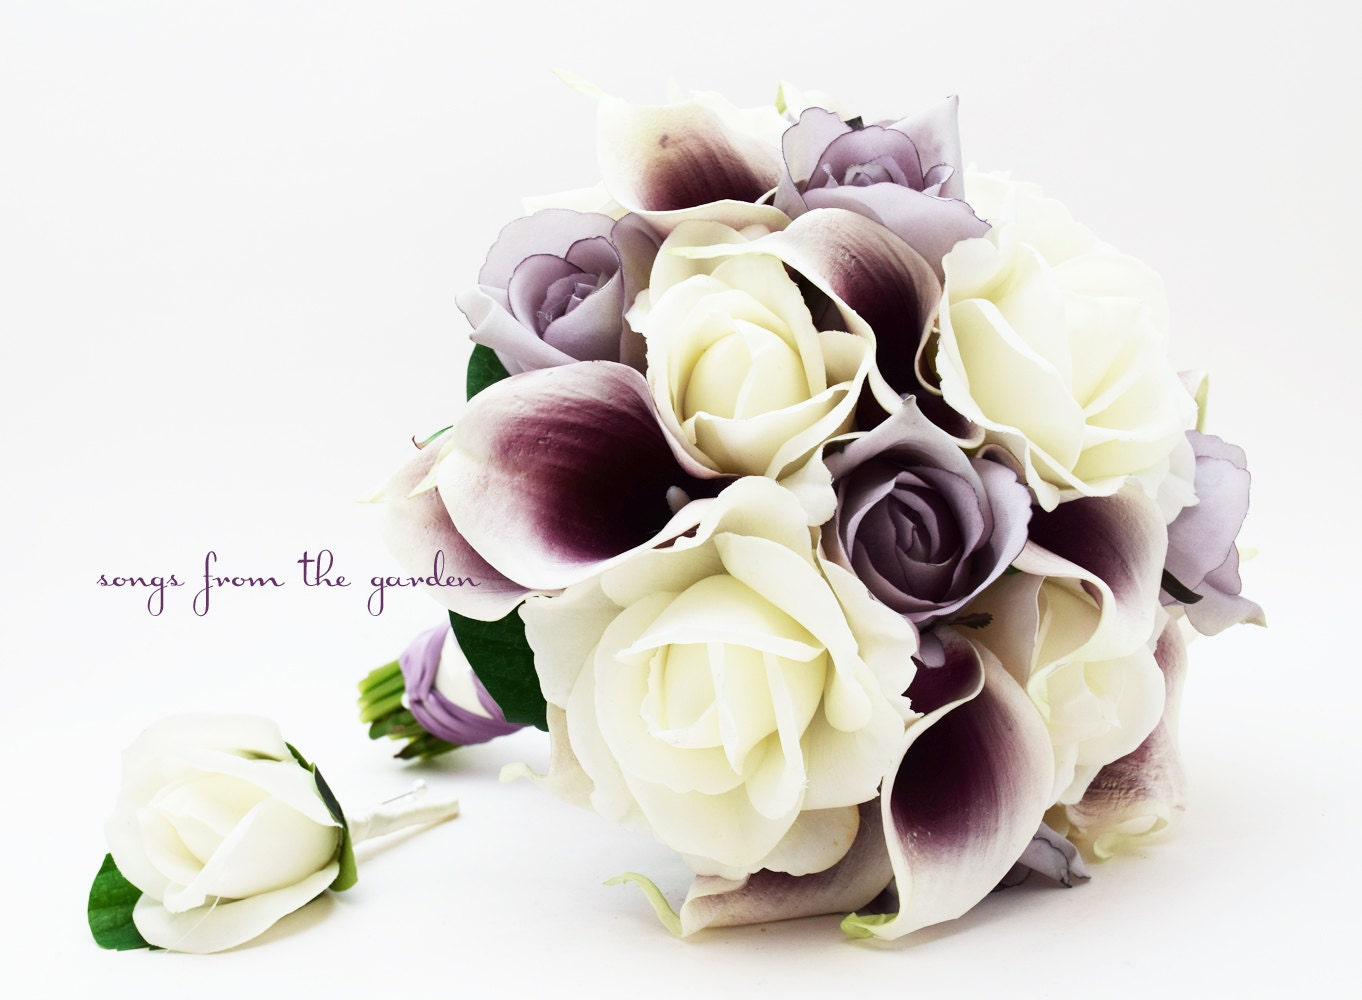 Bridal bouquets calla lilies roses wedding flowers laura s bridal bouquets calla lilies roses lavender white roses picasso calla lilies bridal bouquet izmirmasajfo Choice Image